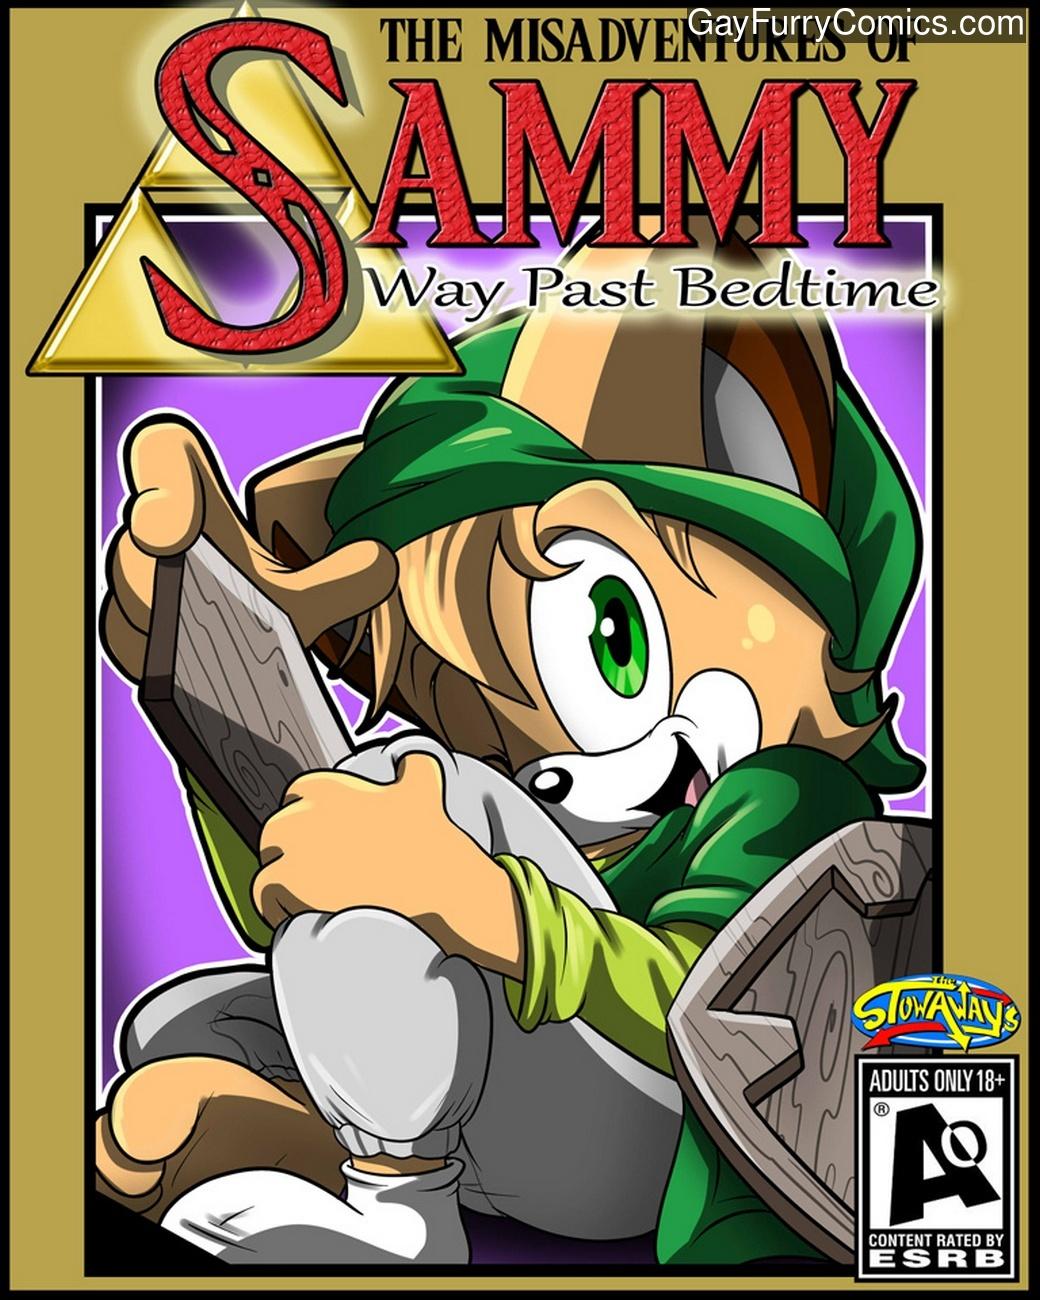 Way Past Bedtime gay furry comic